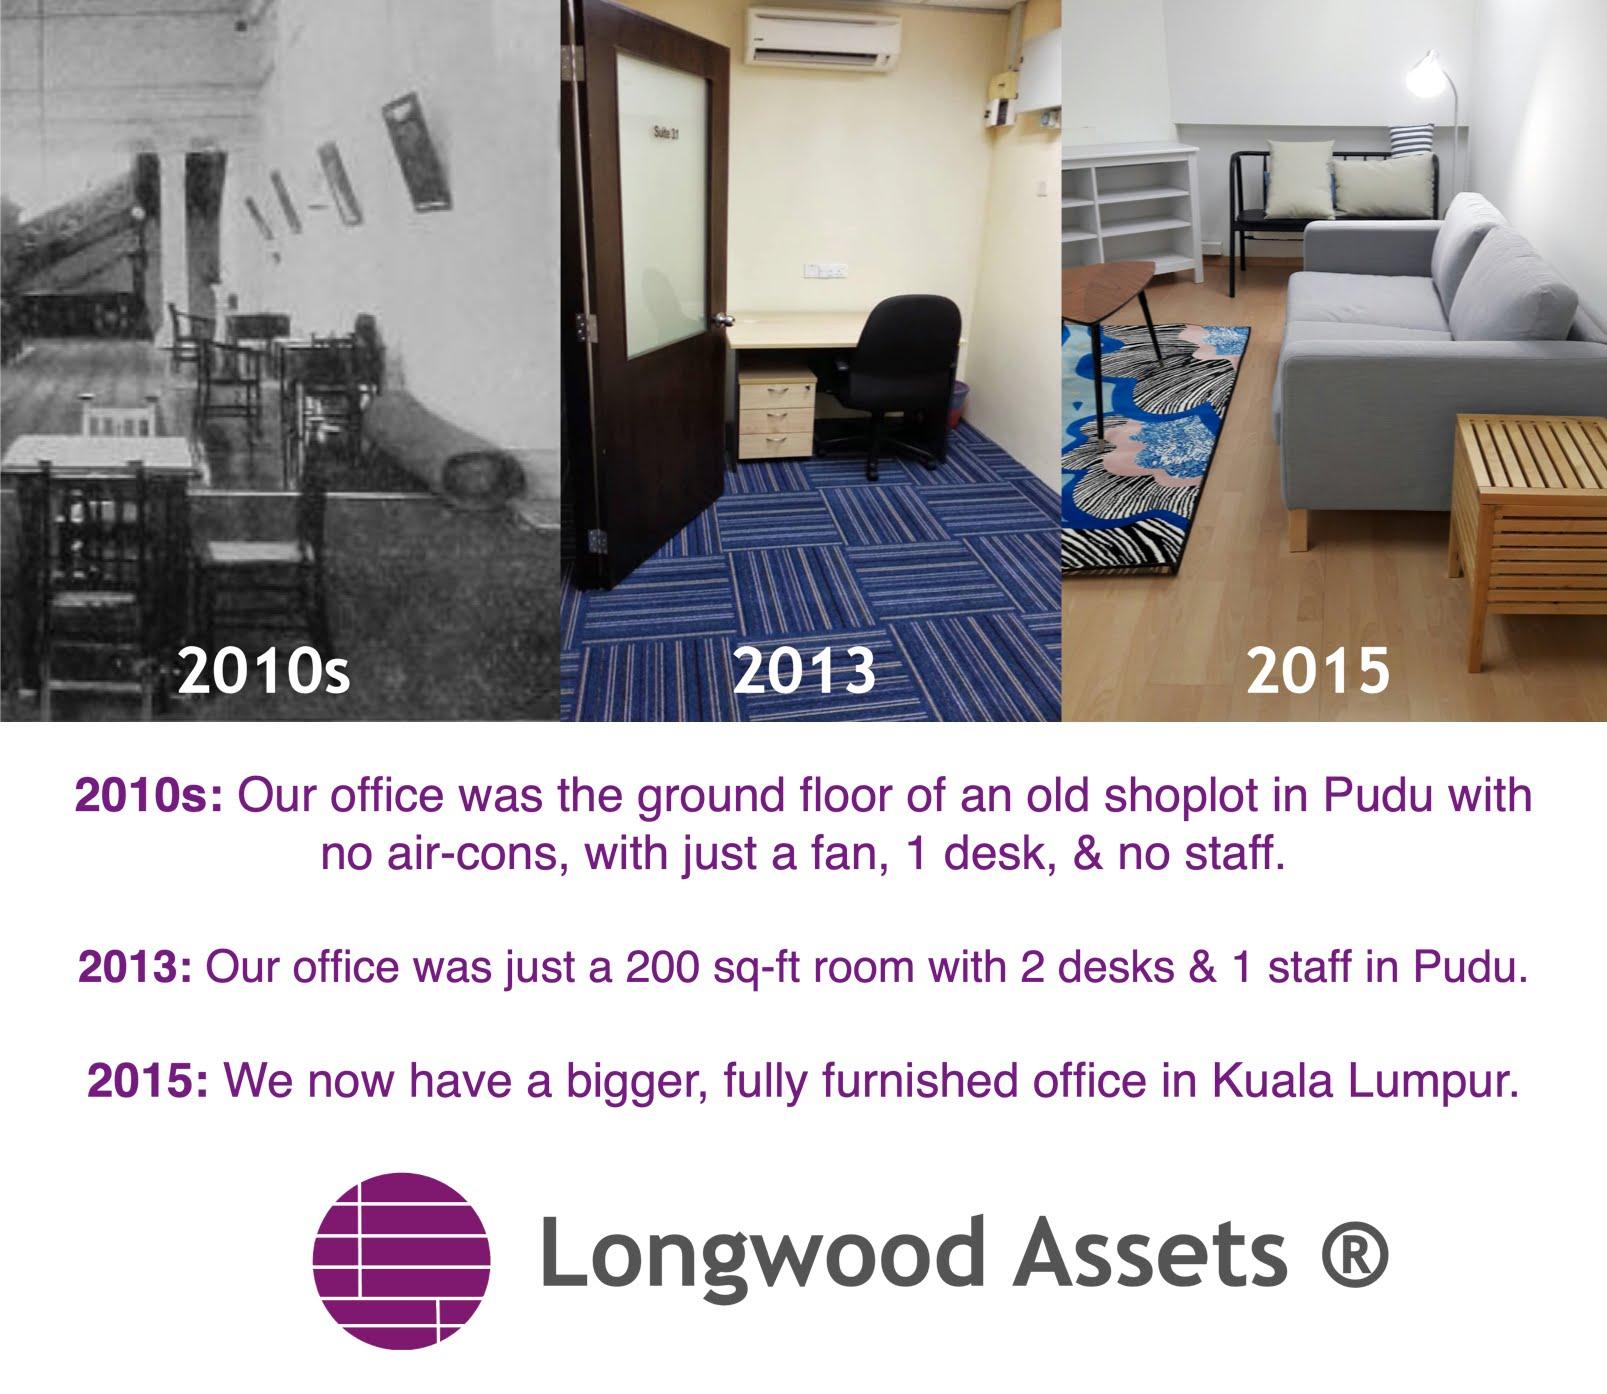 Longwood Assets Trademark